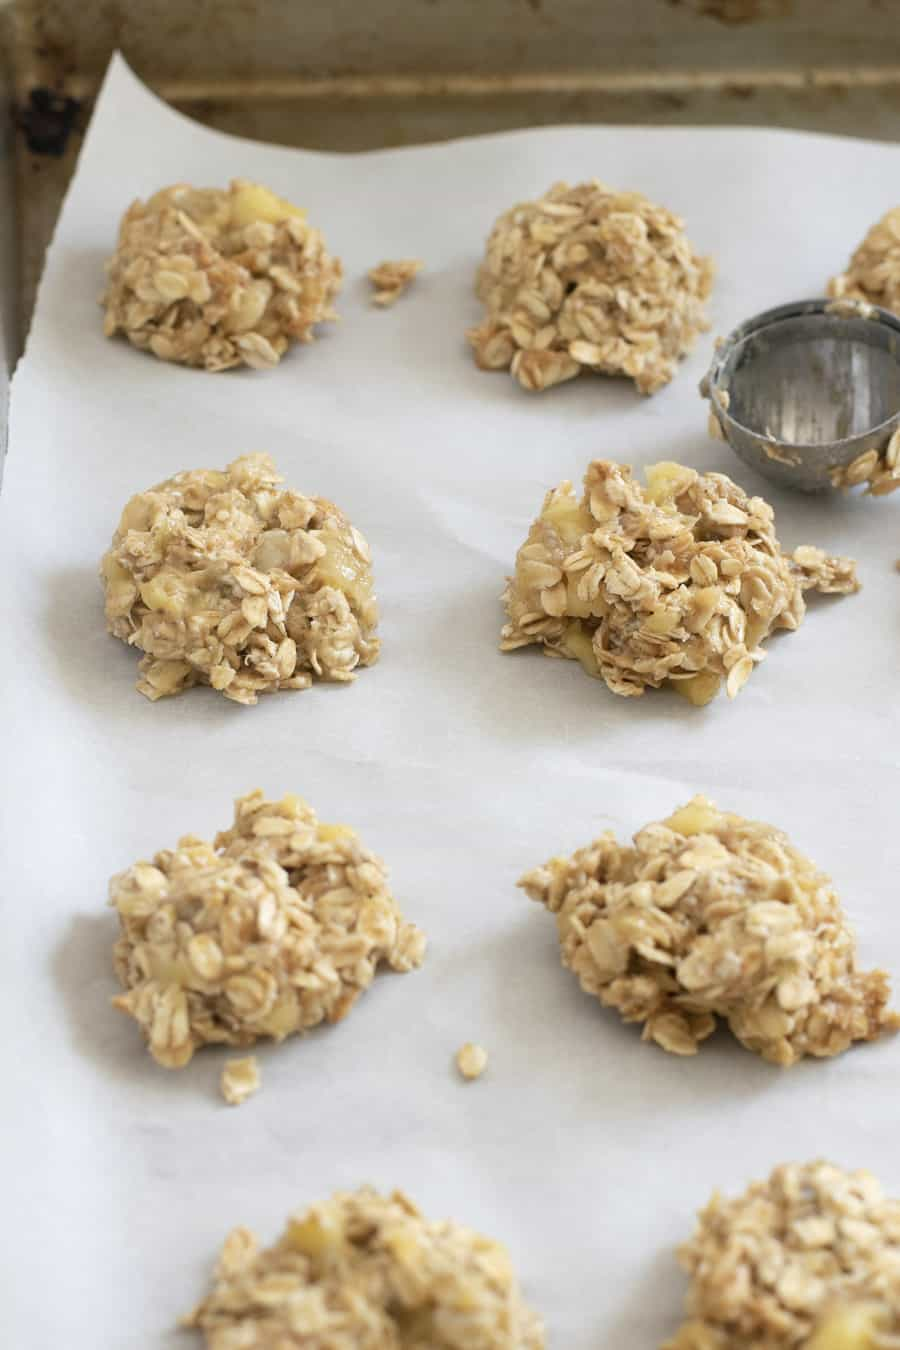 baking sheet with peanut butter banana oatmeal cookies before baking